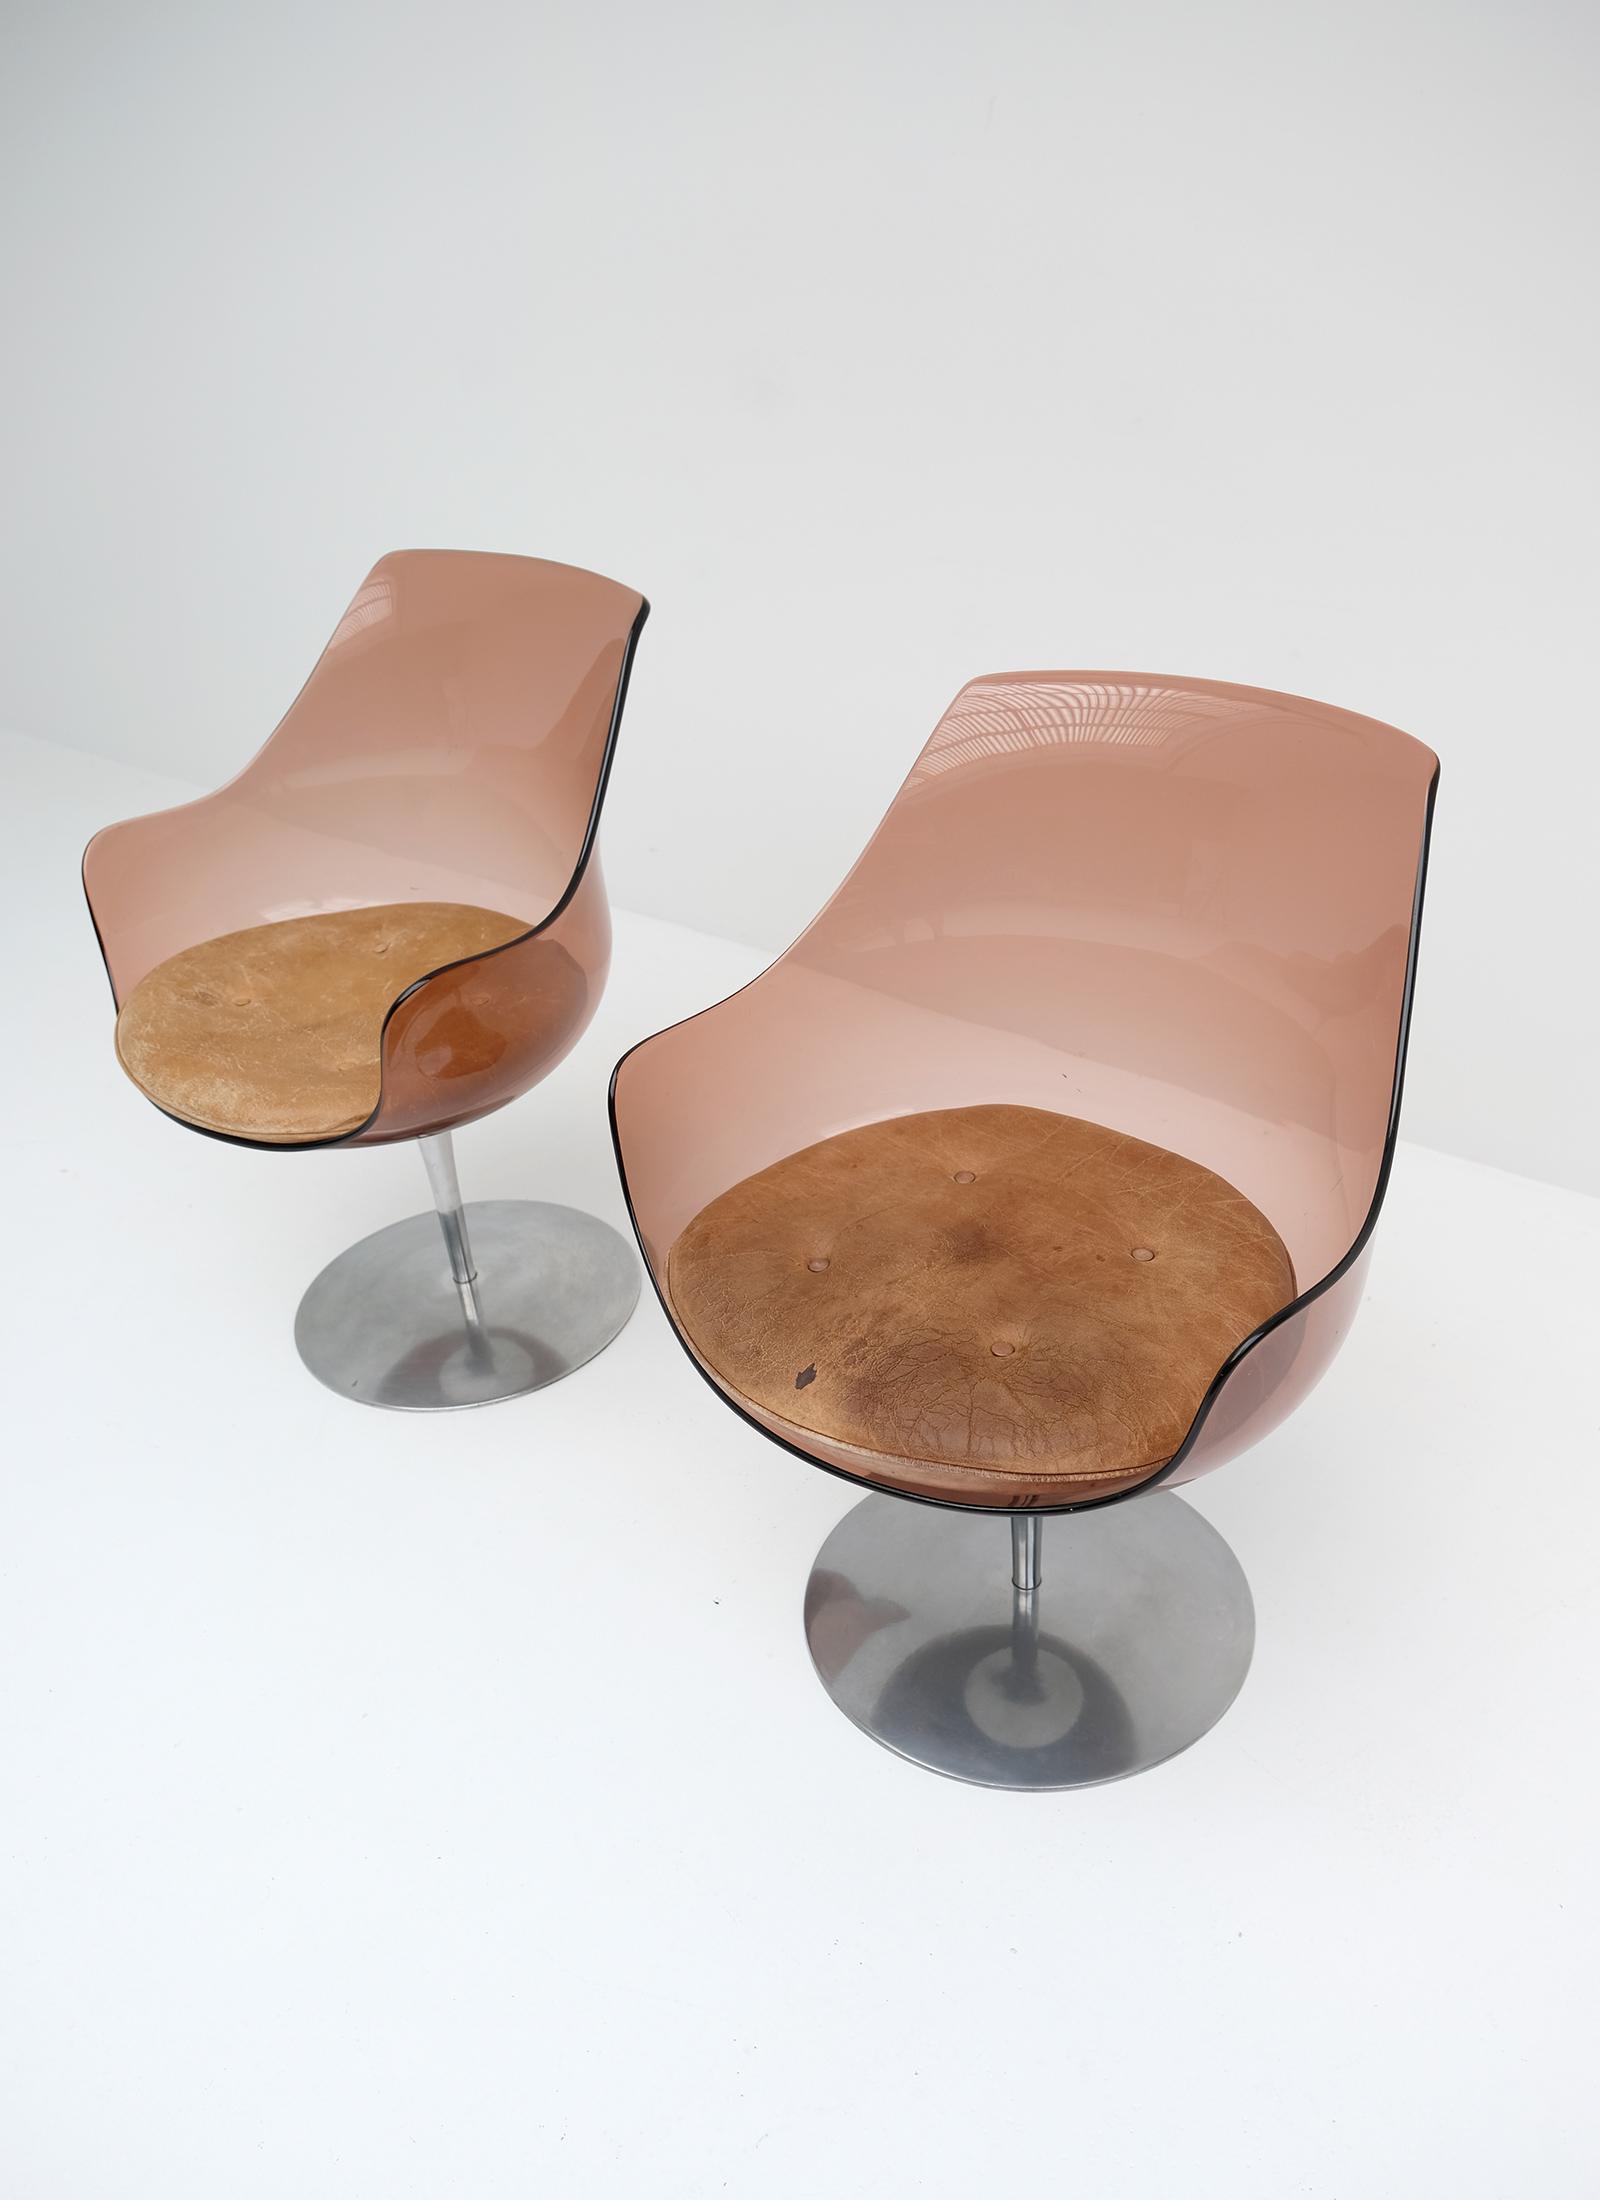 Laverne Champagne Chairs Formes Nouvellesimage 4